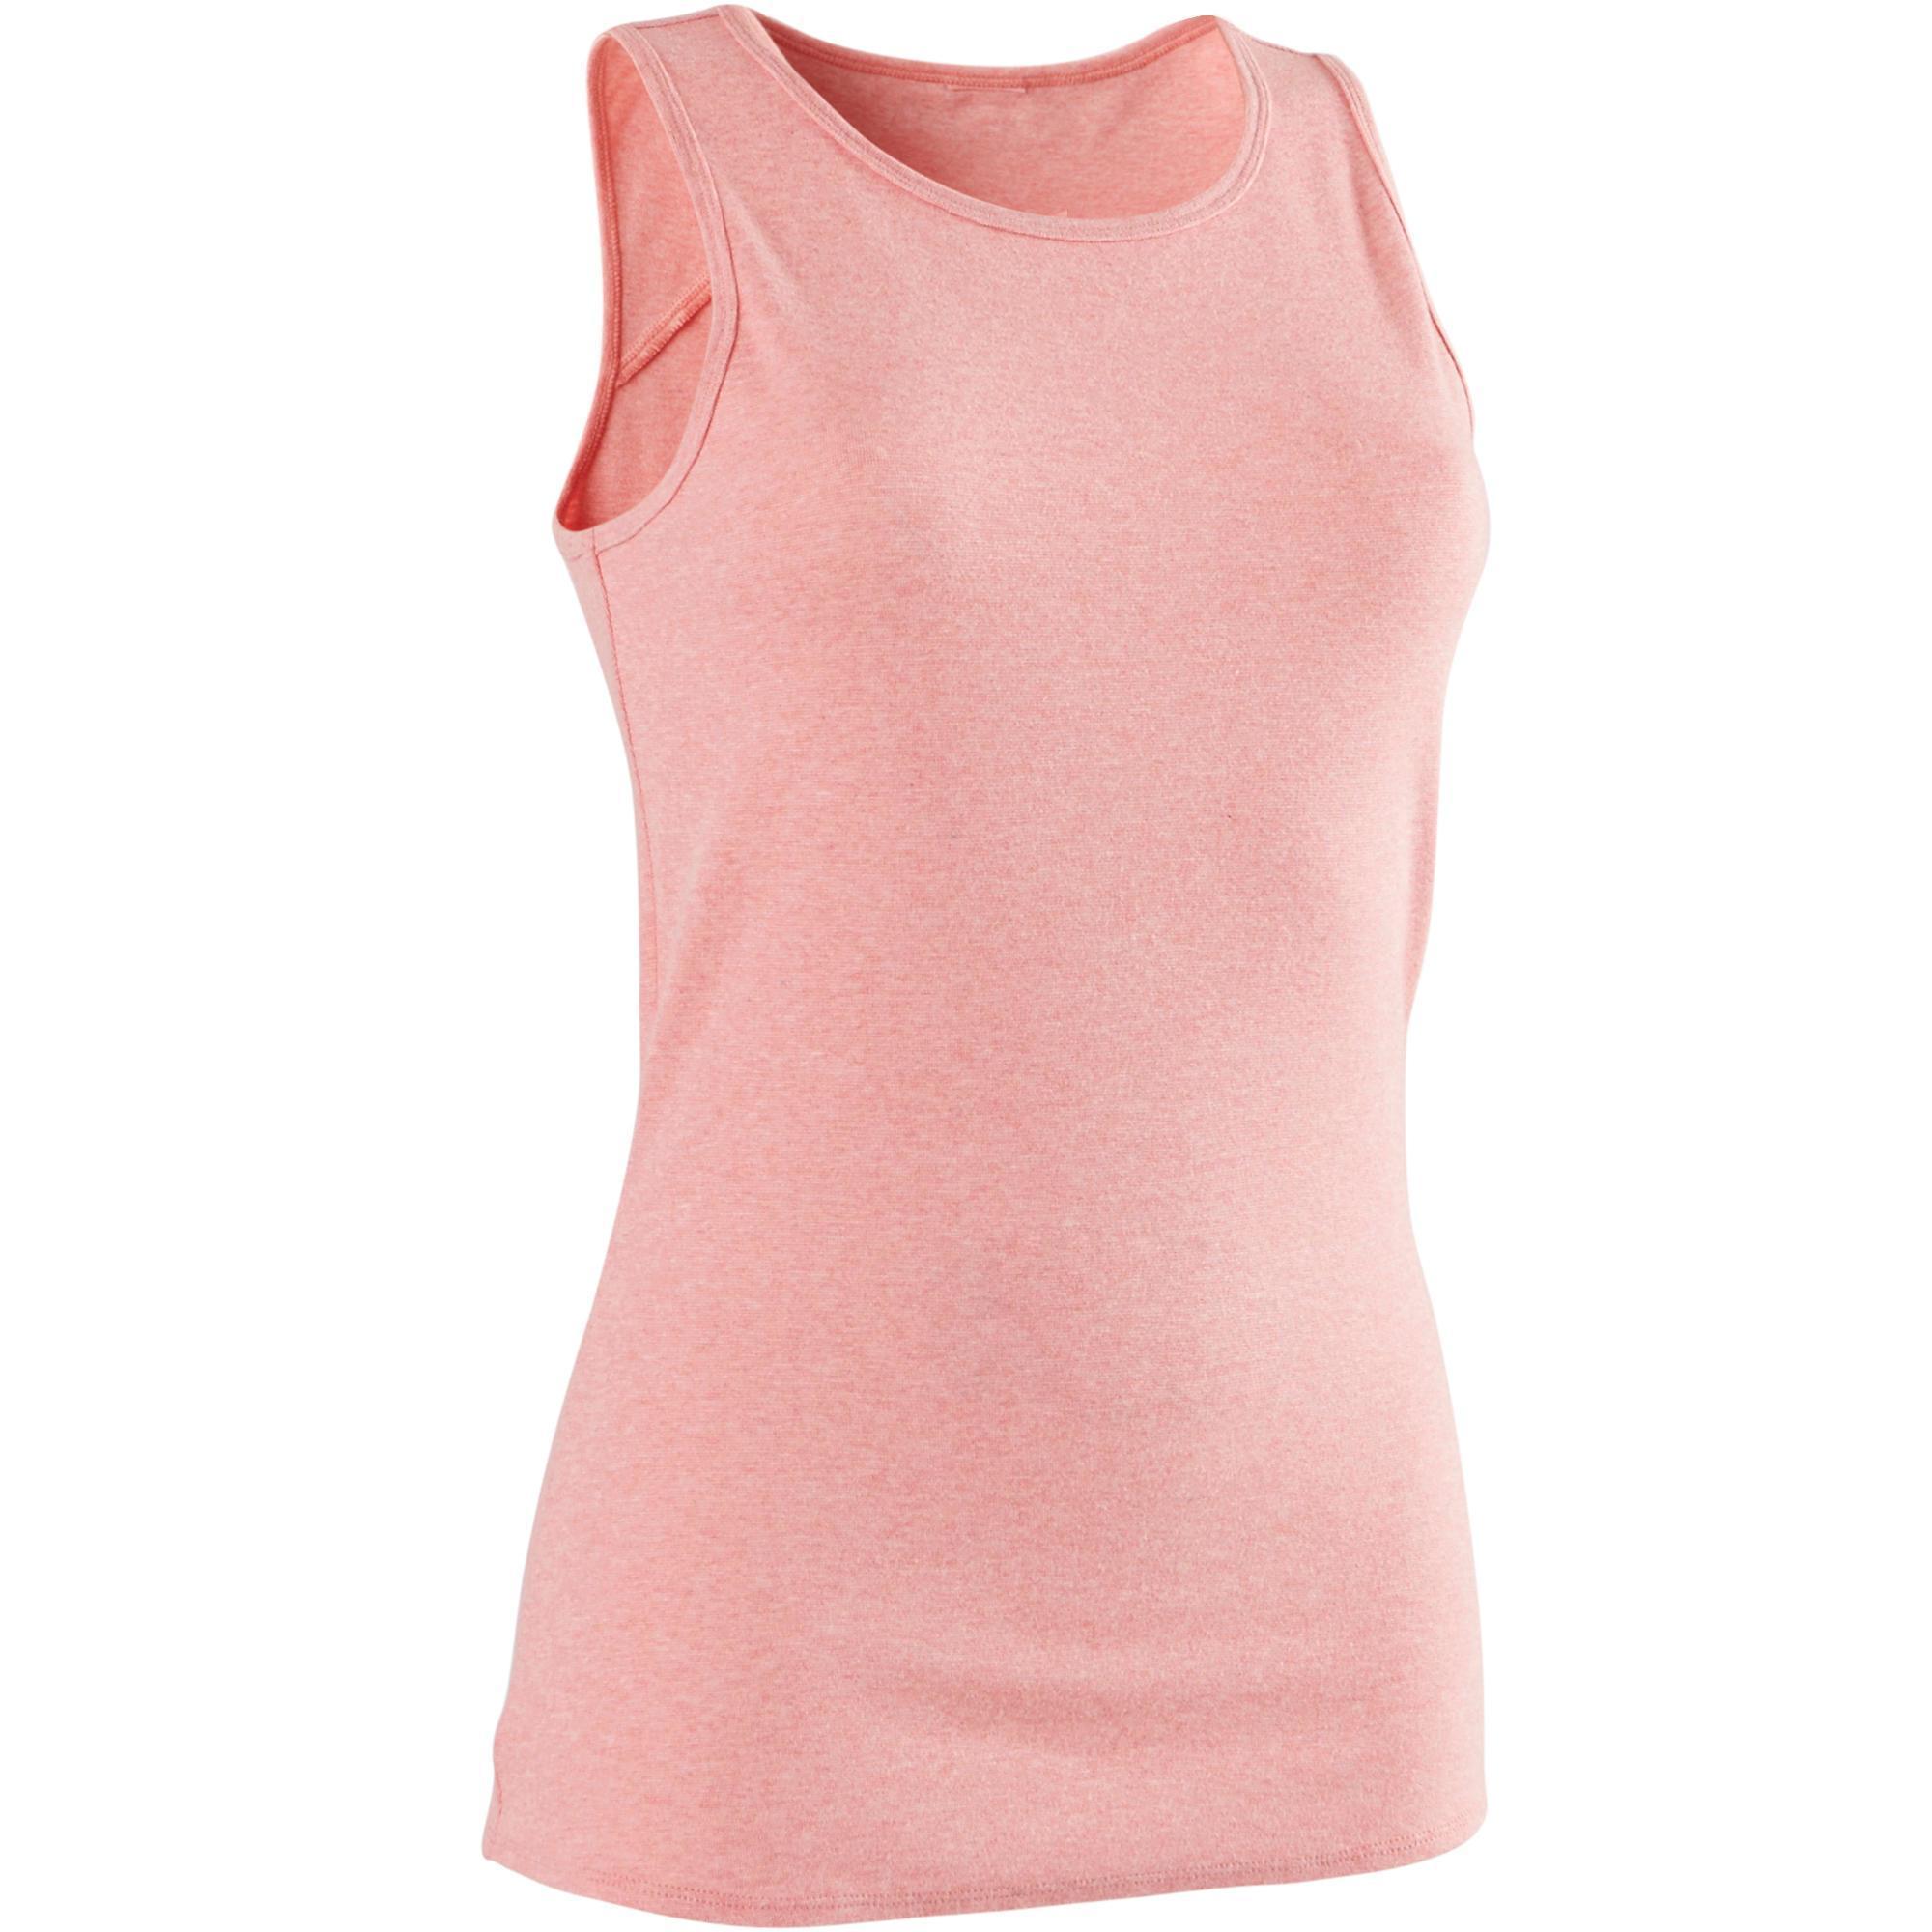 Domyos Top 500 pilates en lichte gym dames gemêleerd roze